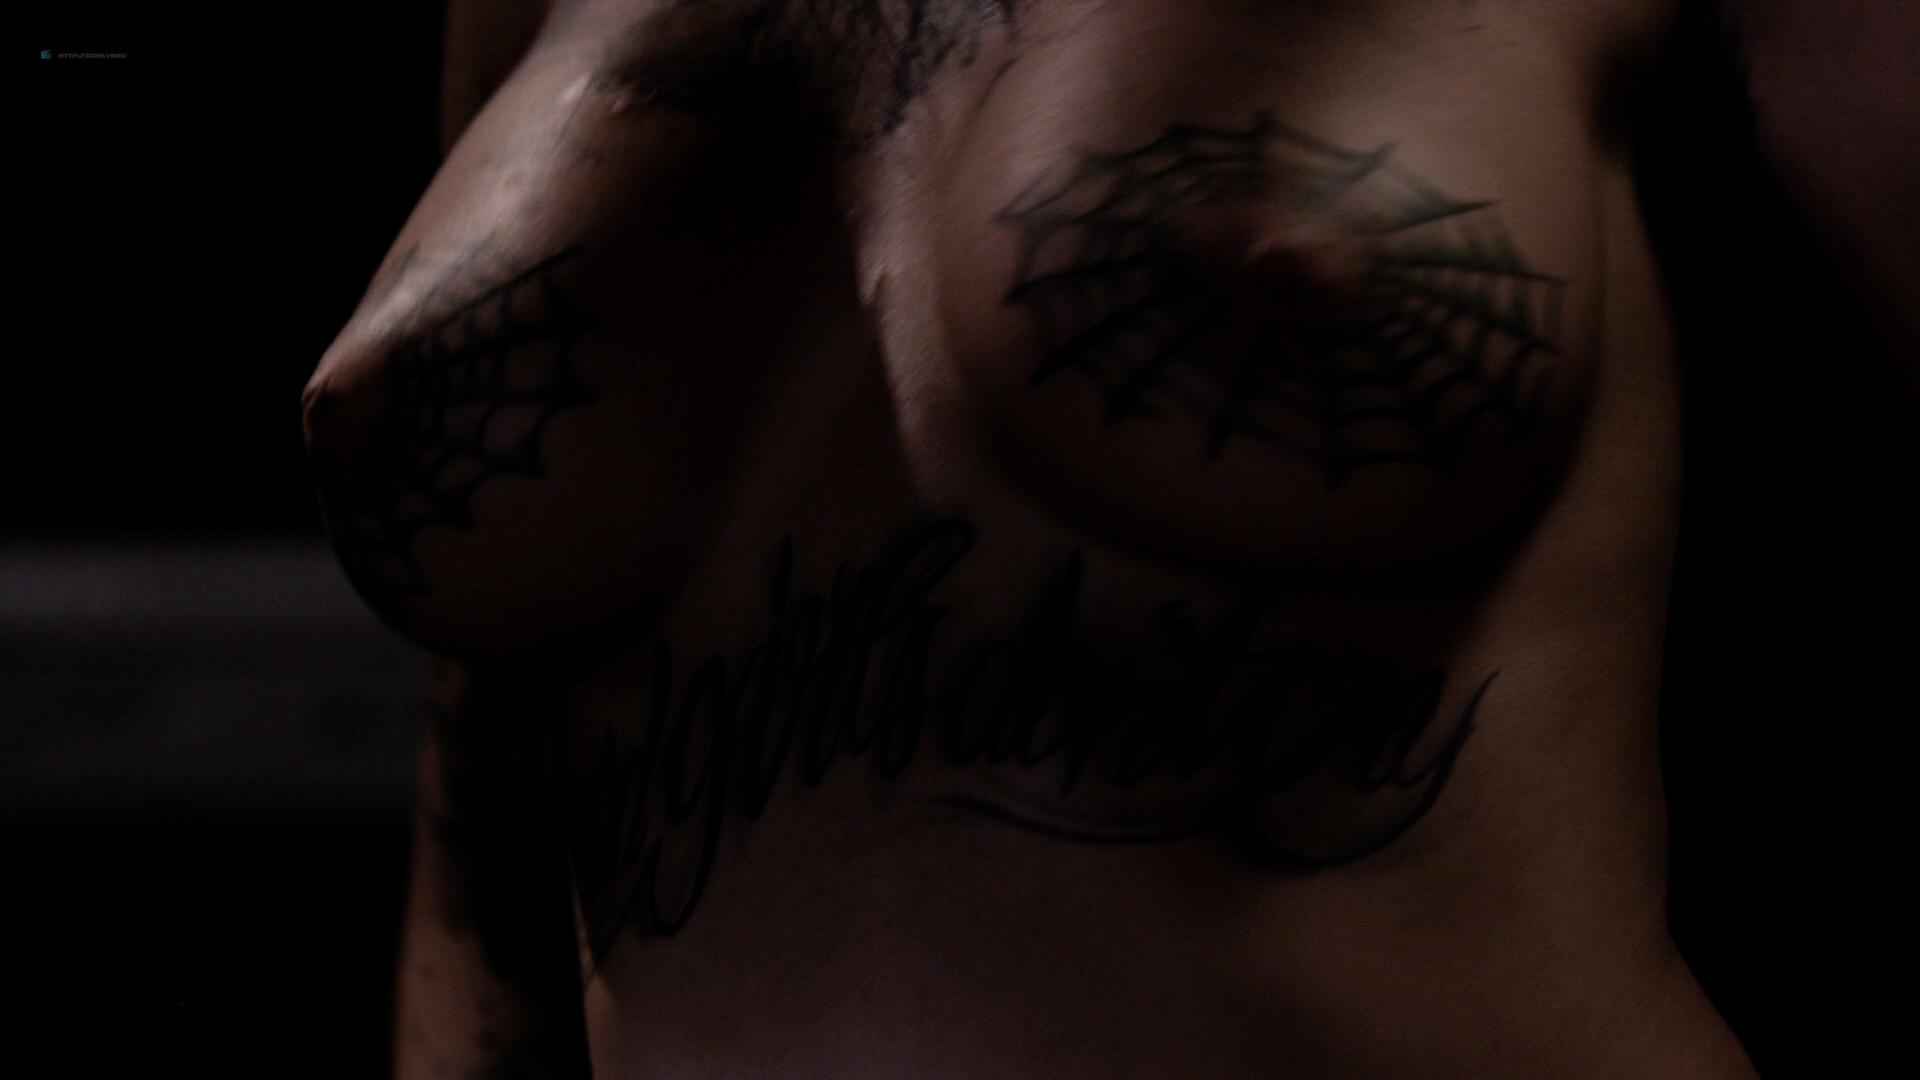 Bonnie Rotten nude sex Malice McMunn nude Lauren Parkinson sex - Appetites (2015) HD 1080p (5)